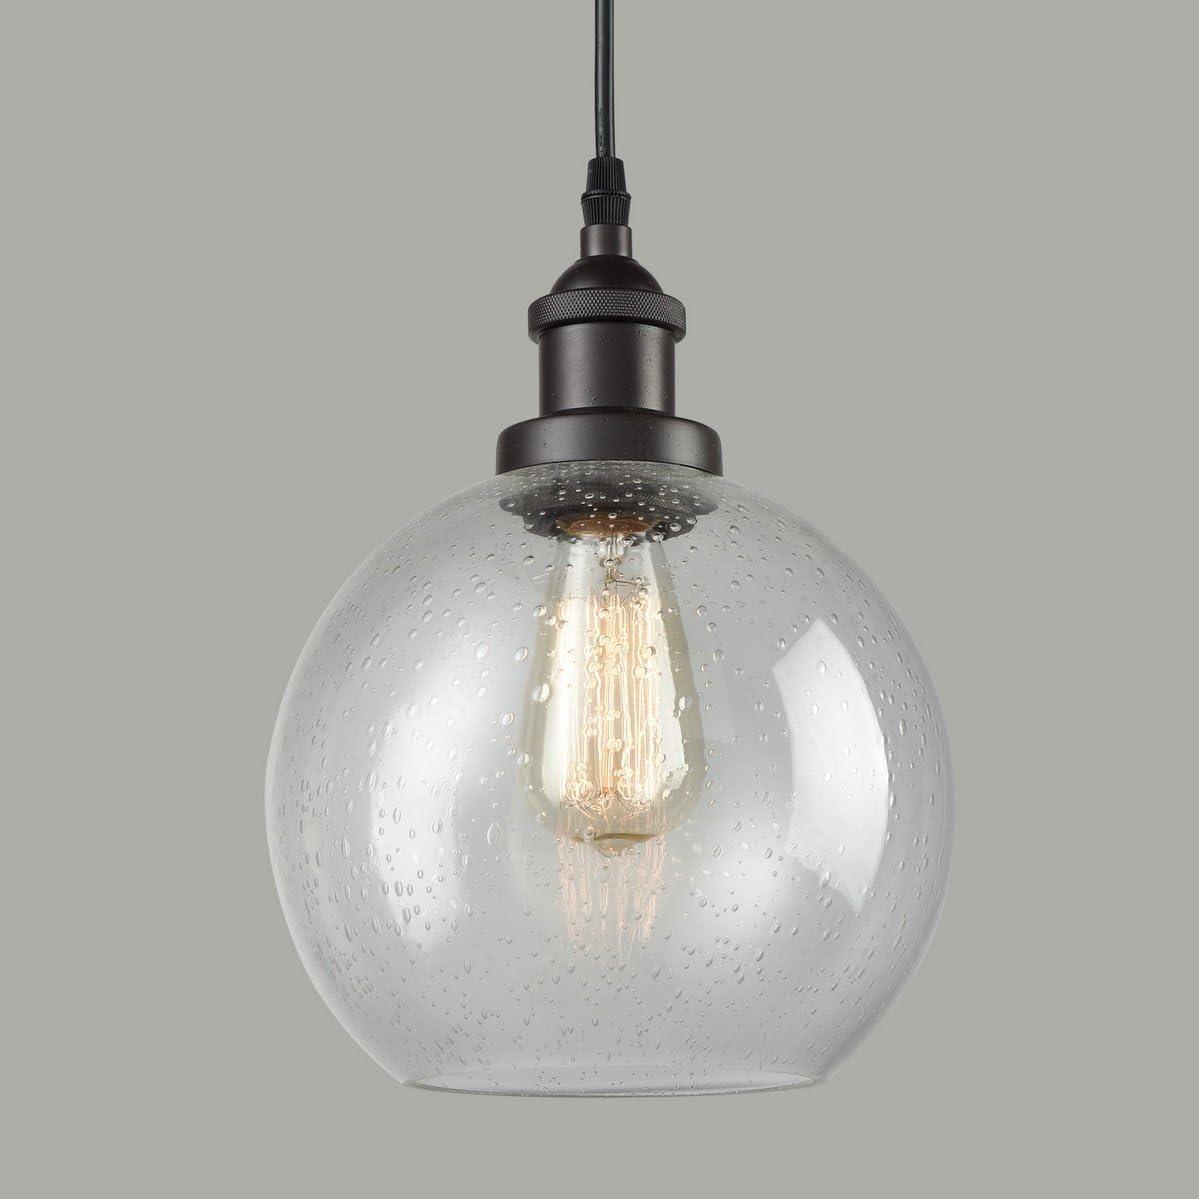 Dazhuan Industrial Vintage Bubble Glass Pendant Light Metal ORB Hanging Lighting